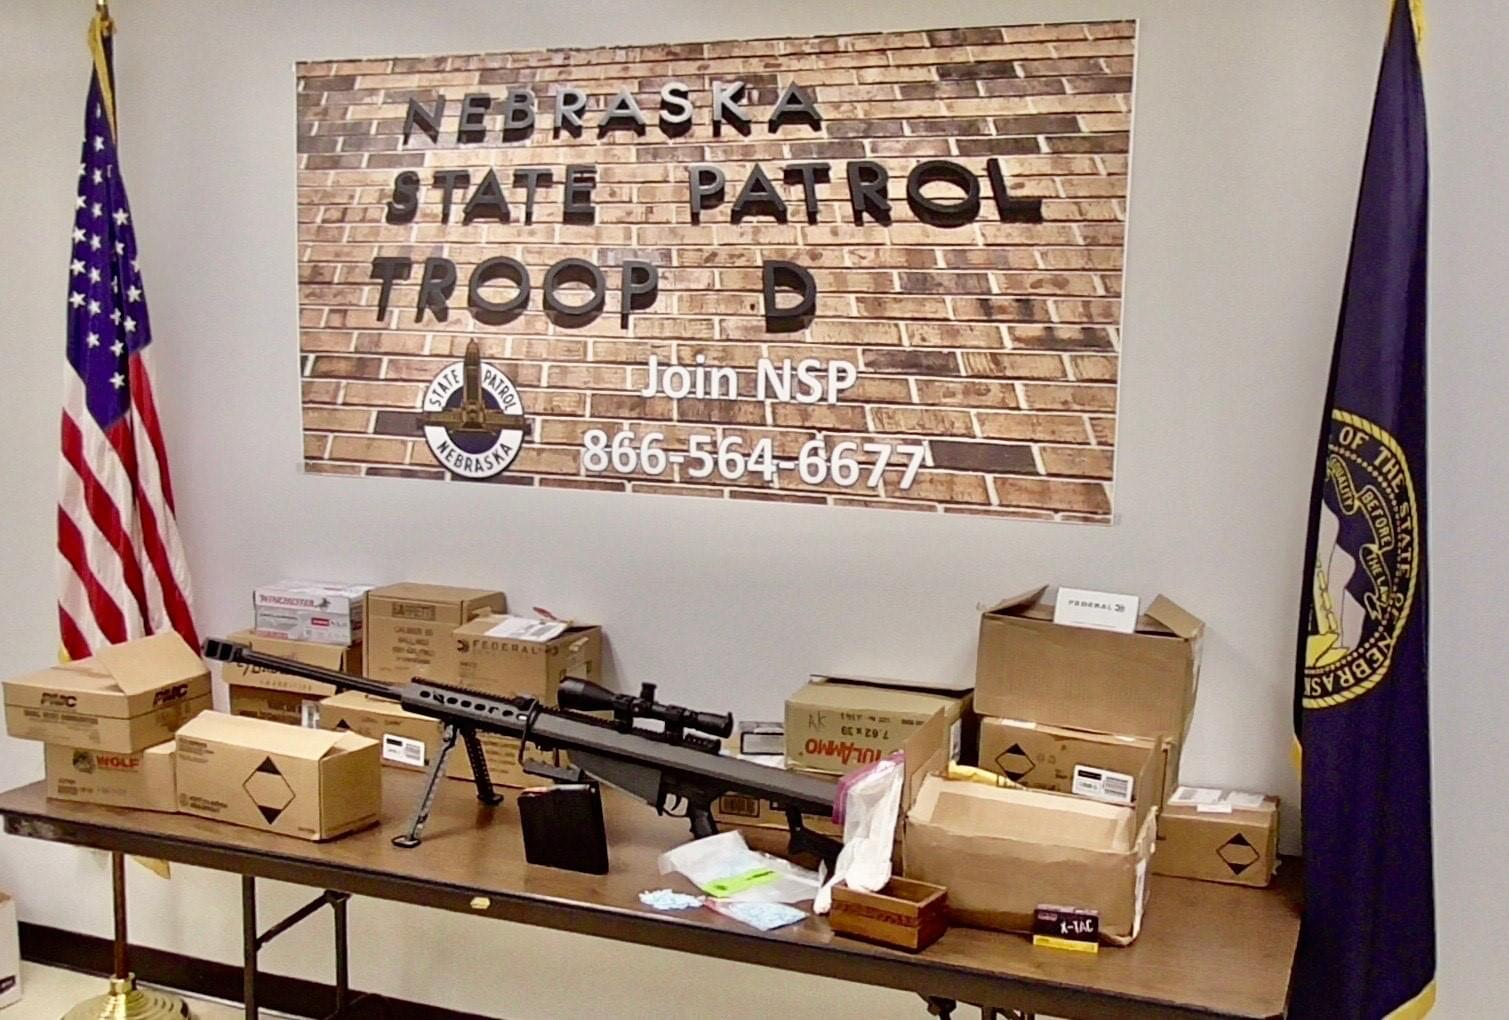 Investigators Find Controlled Pills at North Platte Business